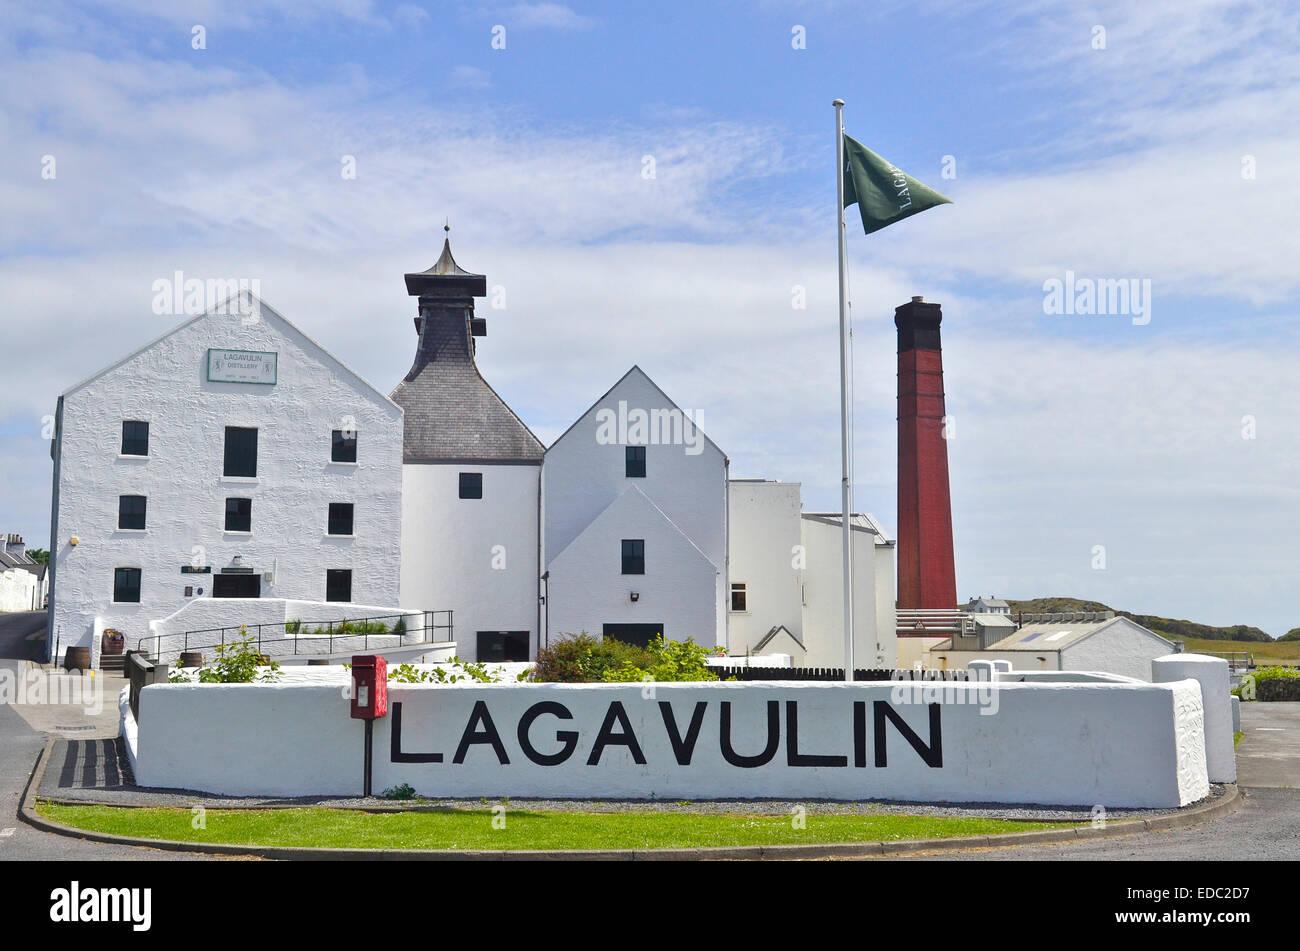 Lagavulin Whisky Distillery, Islay, Scotland - Stock Image